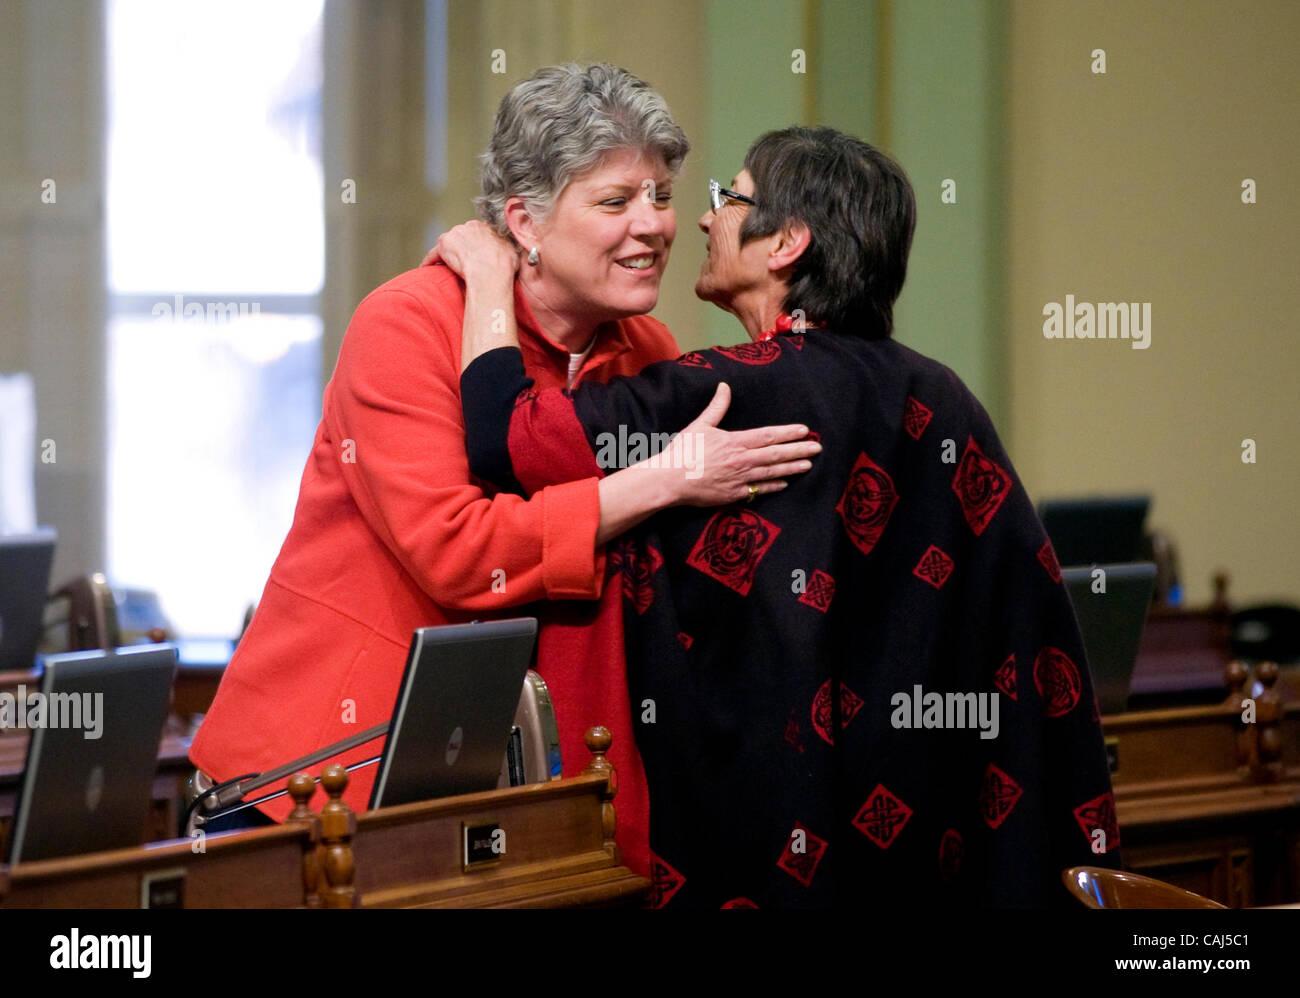 Assembly members Julia Brownley, D- Santa Monica, left, hugs fellow member Patty Berg, D-Eureka, as the Assembly - Stock Image